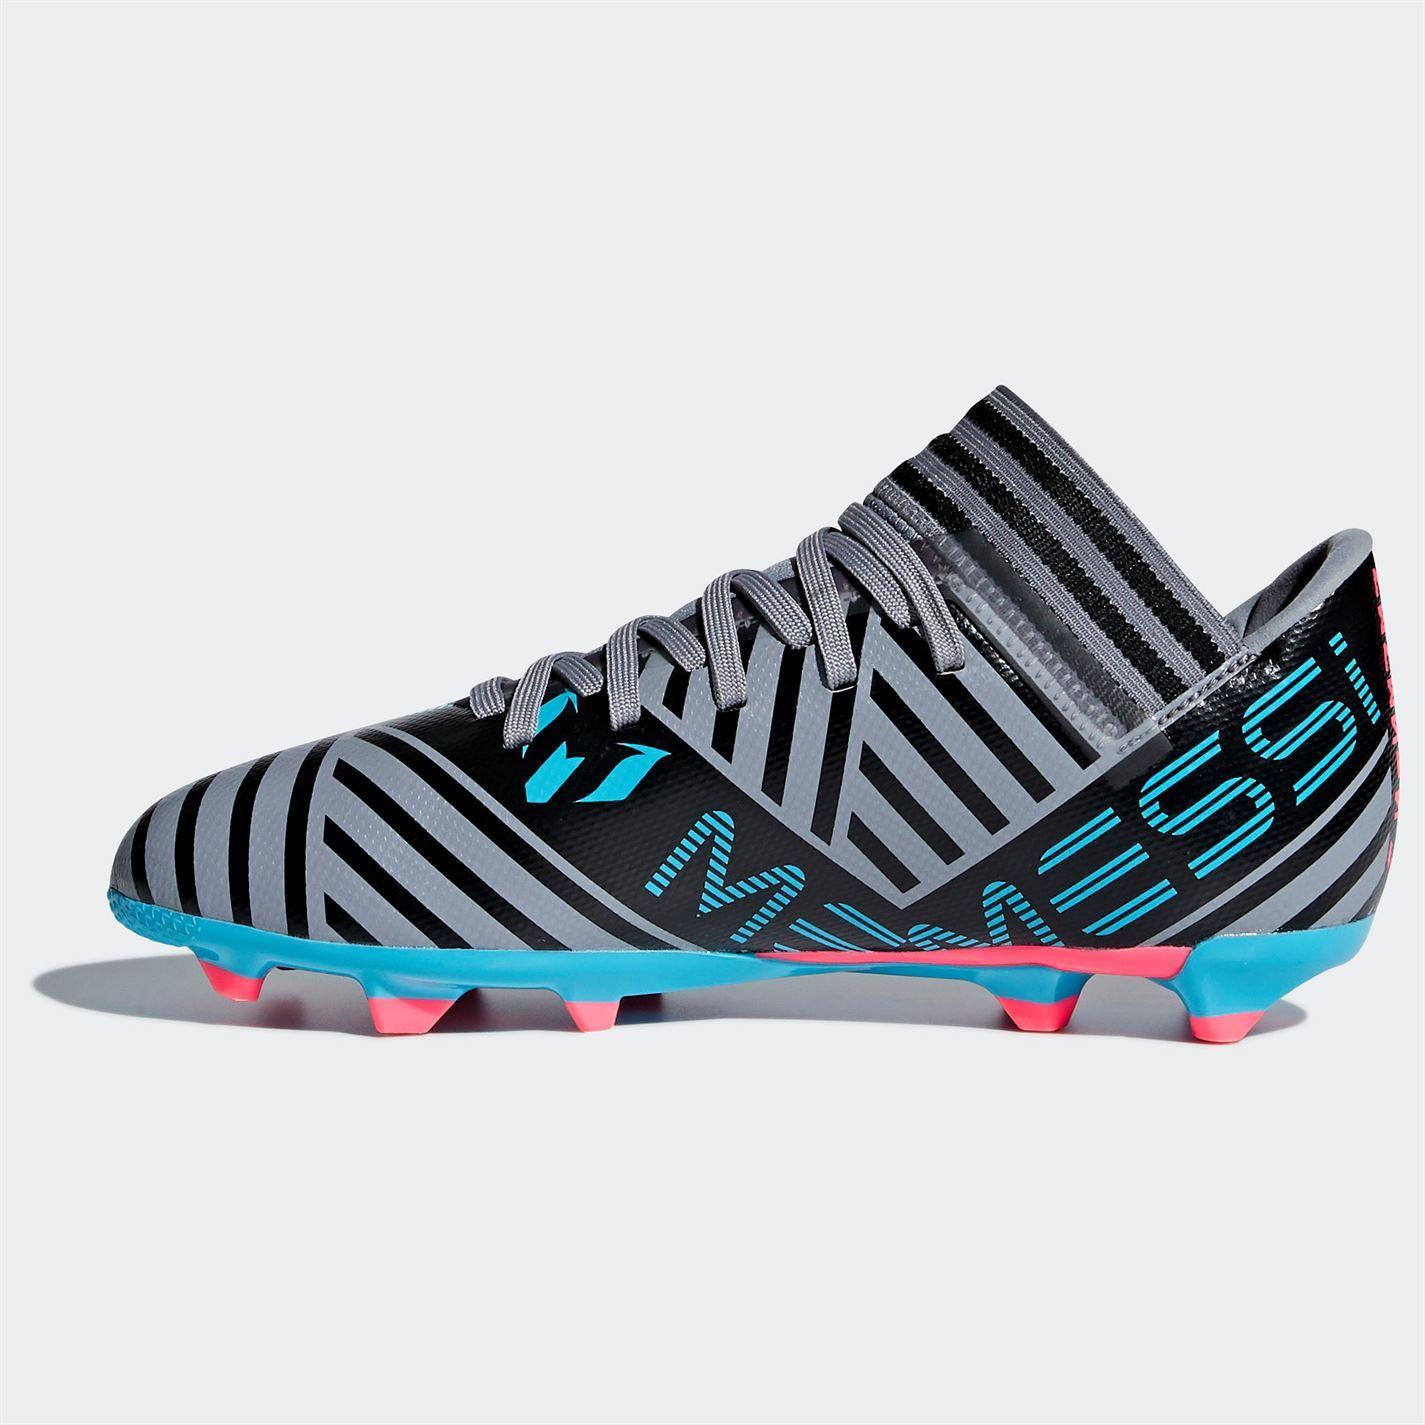 on sale 847bc f2f9f ... adidas Nemeziz Messi 17.3 FG Football Boots Juniors Grey Blk Soccer  Shoes Cleats